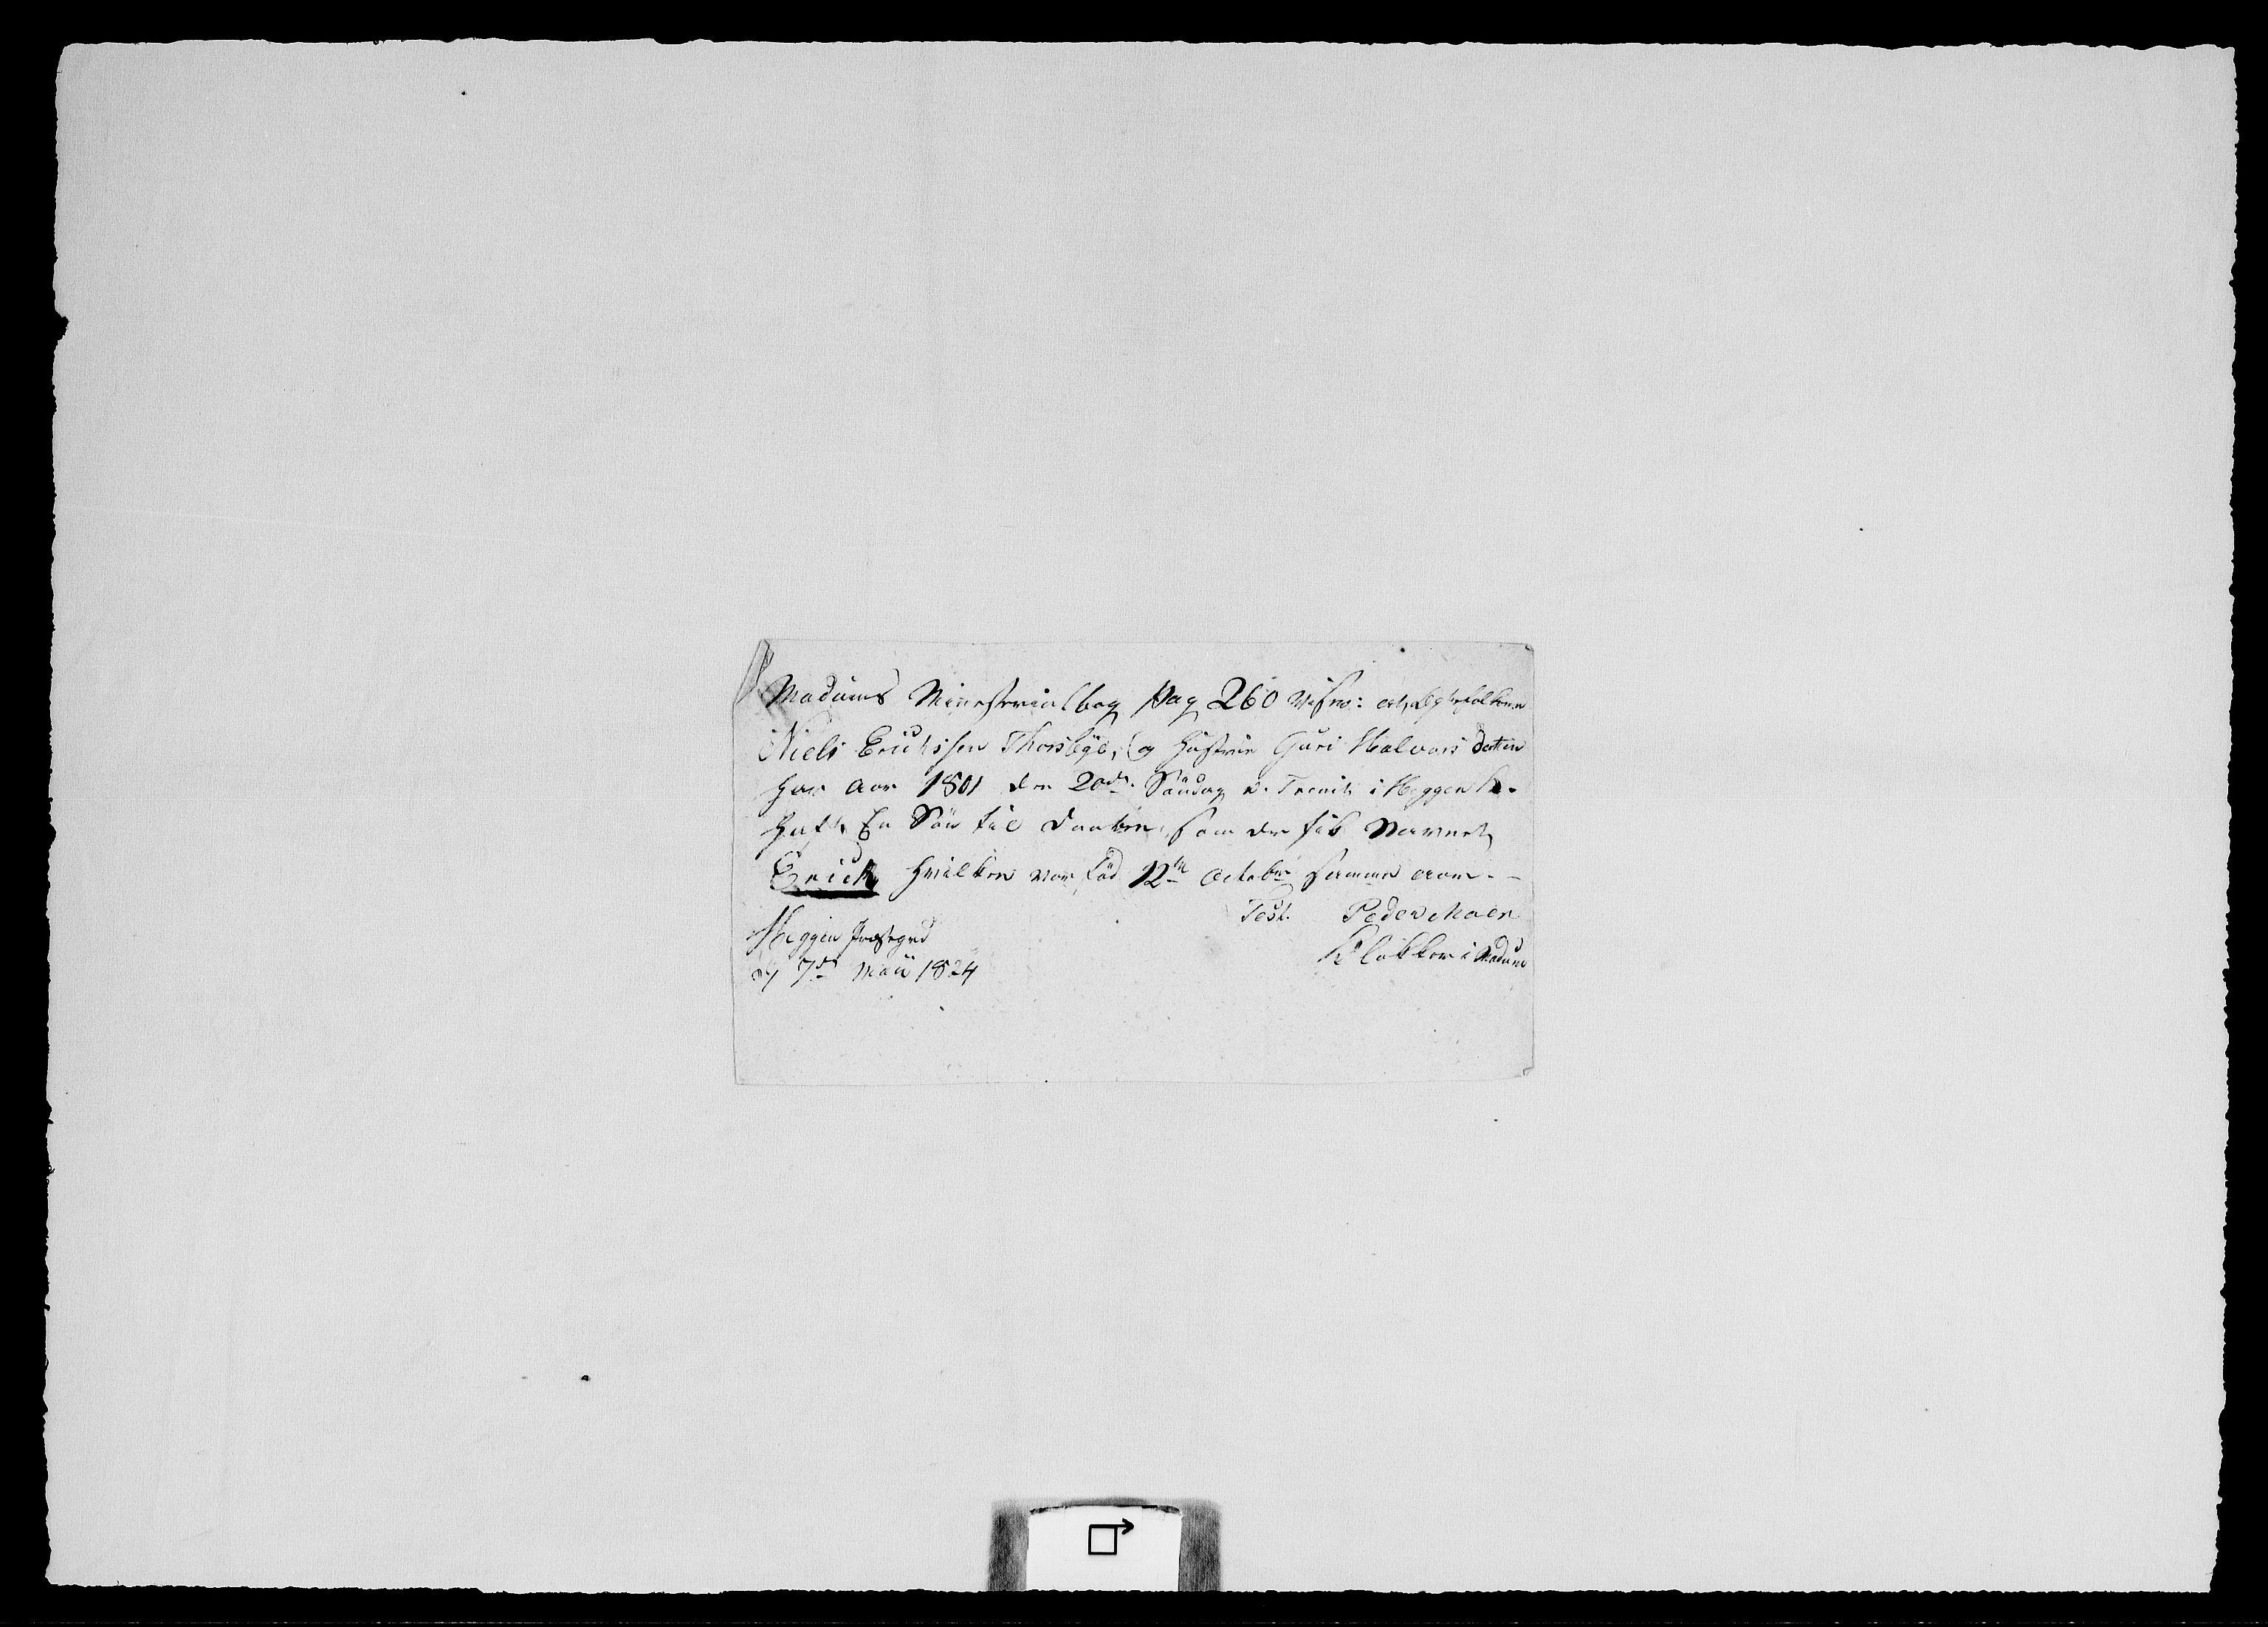 RA, Modums Blaafarveværk, G/Gg/L0373, 1822-1848, s. 2